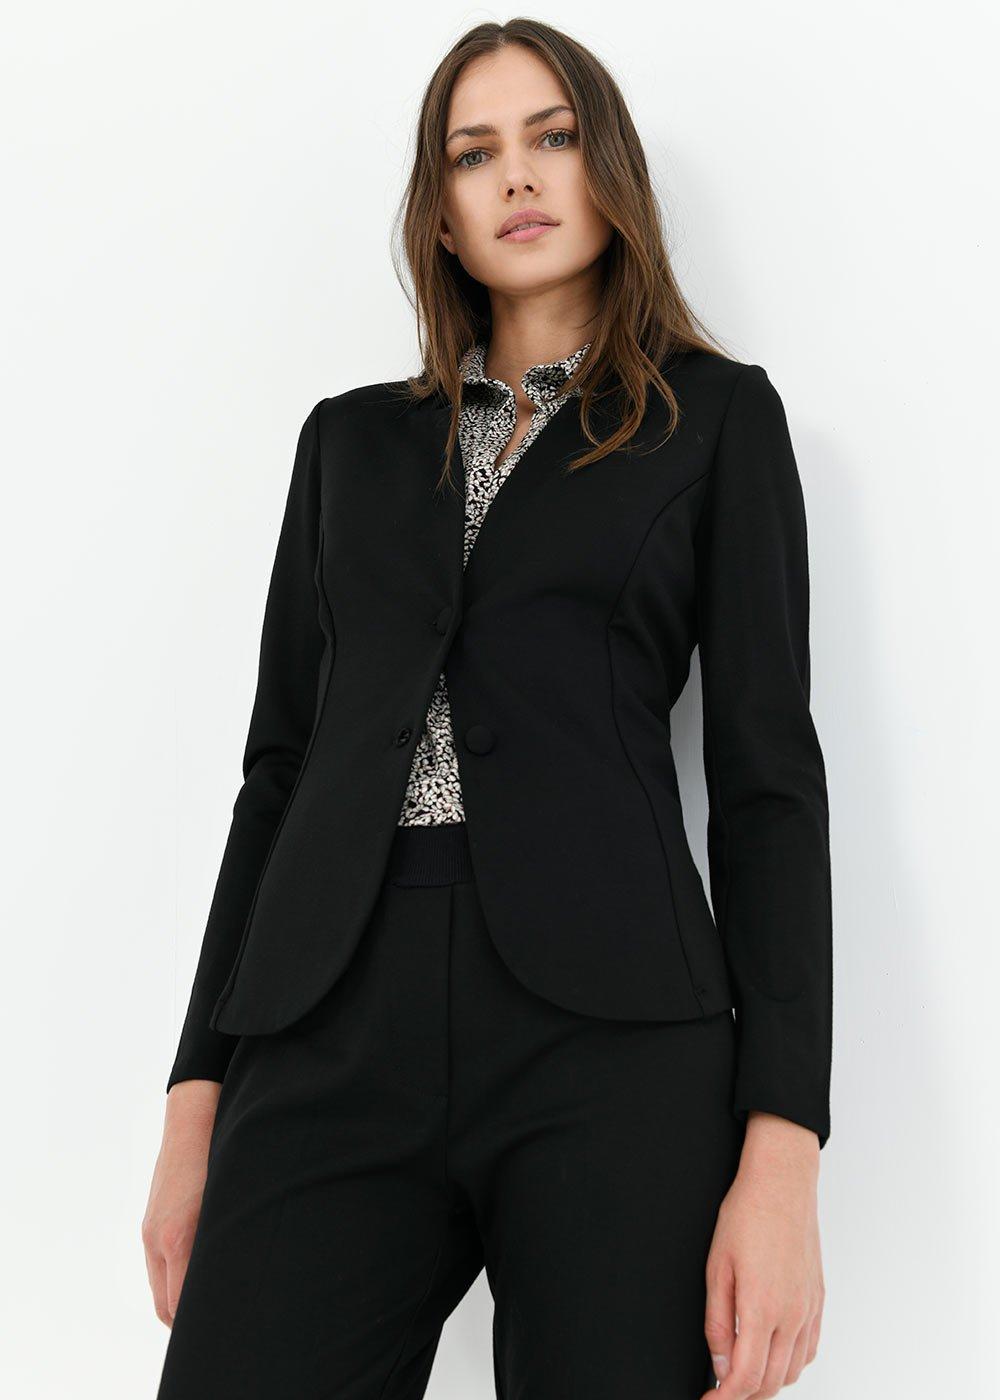 Corynn jacket model cardigan - Black - Woman